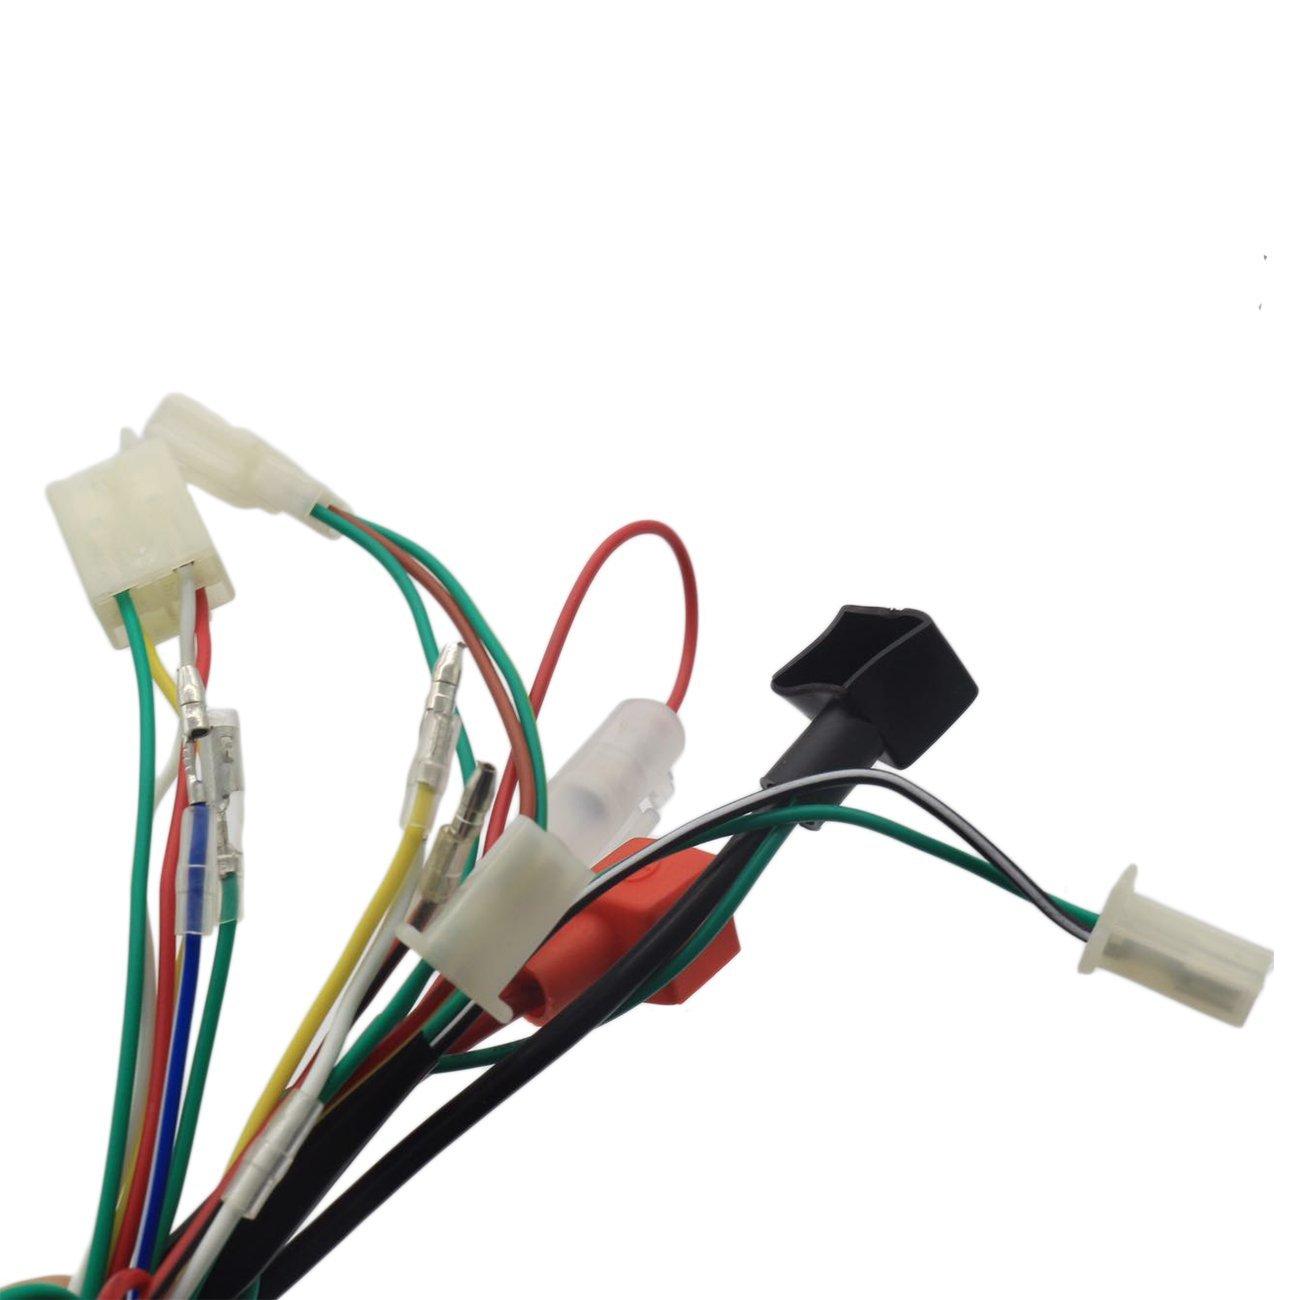 Jingke Complete Electrics Stator Coil Cdi Wiring Harness For 4 Zongshen Stroke Atv Klx 50cc 70cc 110cc